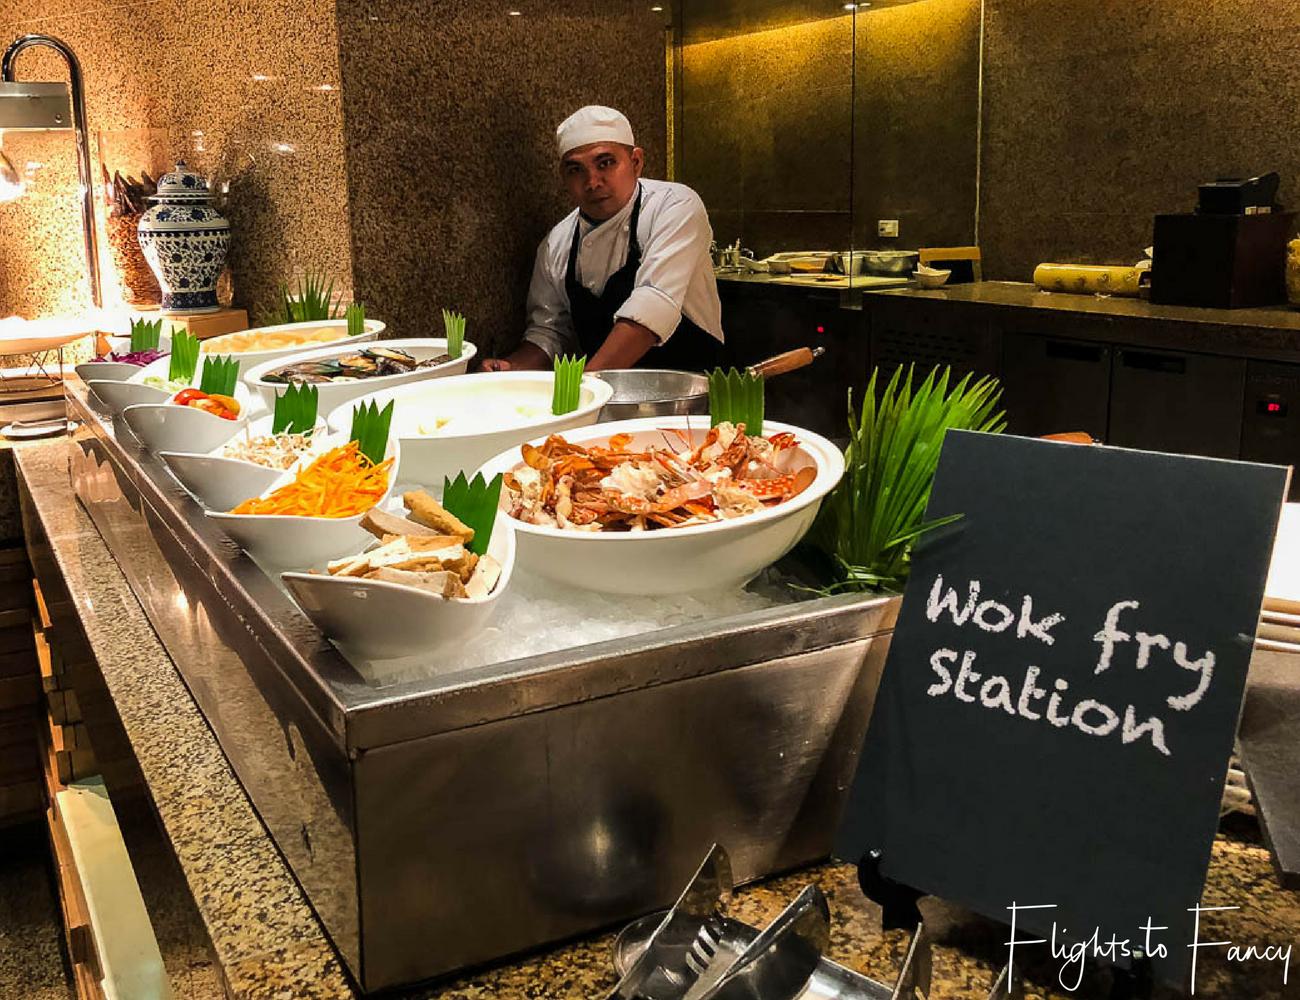 Hotel near SM Cebu City - Radisson Blue Cebu Dinner Buffet Feria Restaurant Wok Fry Station by Flights to Fancy